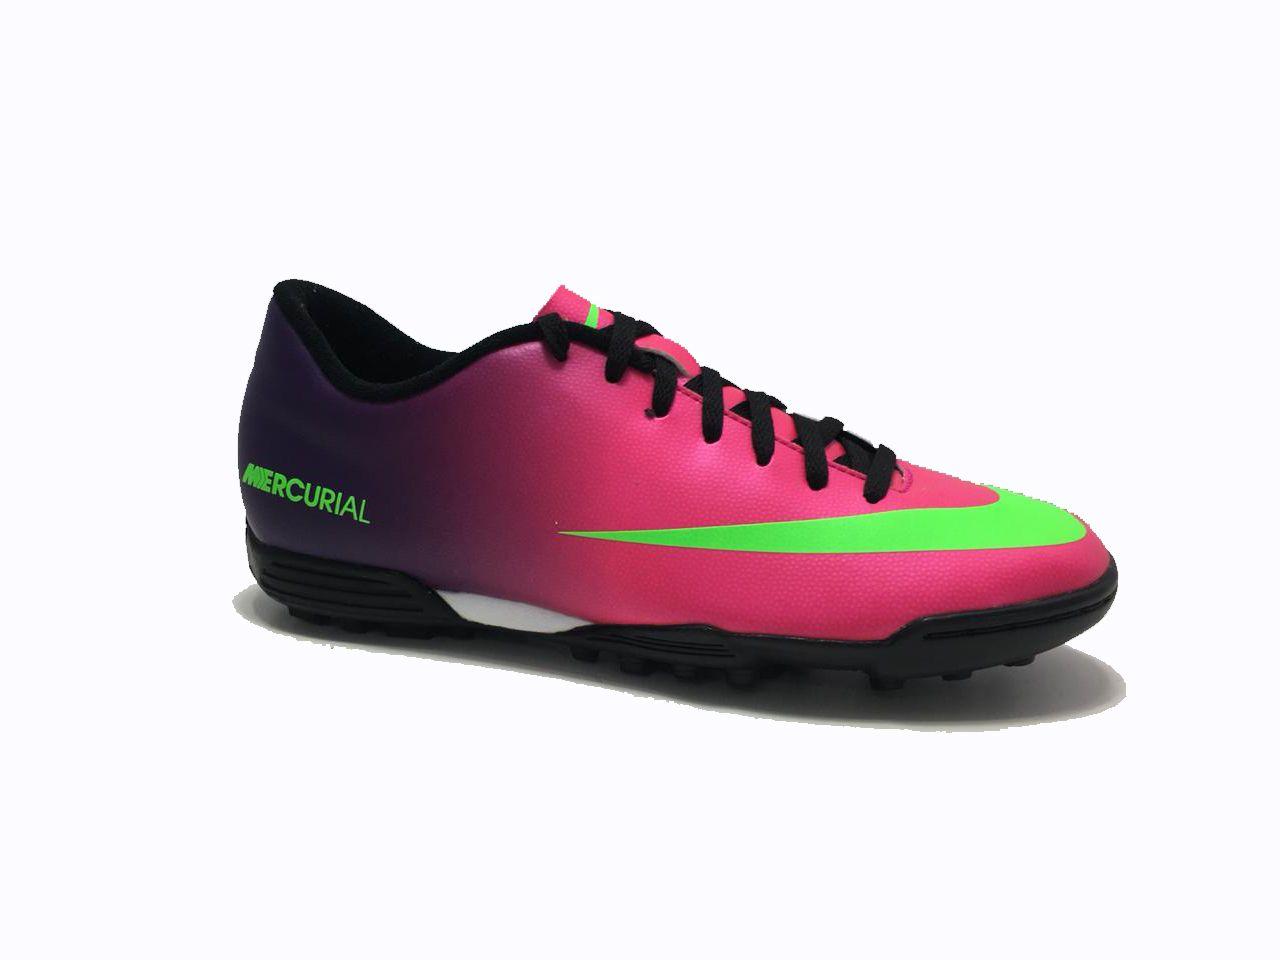 992758a9f7b88 Chuteira Society Nike Mercurial Vortex TF - BRACIA SHOP  Loja de ...